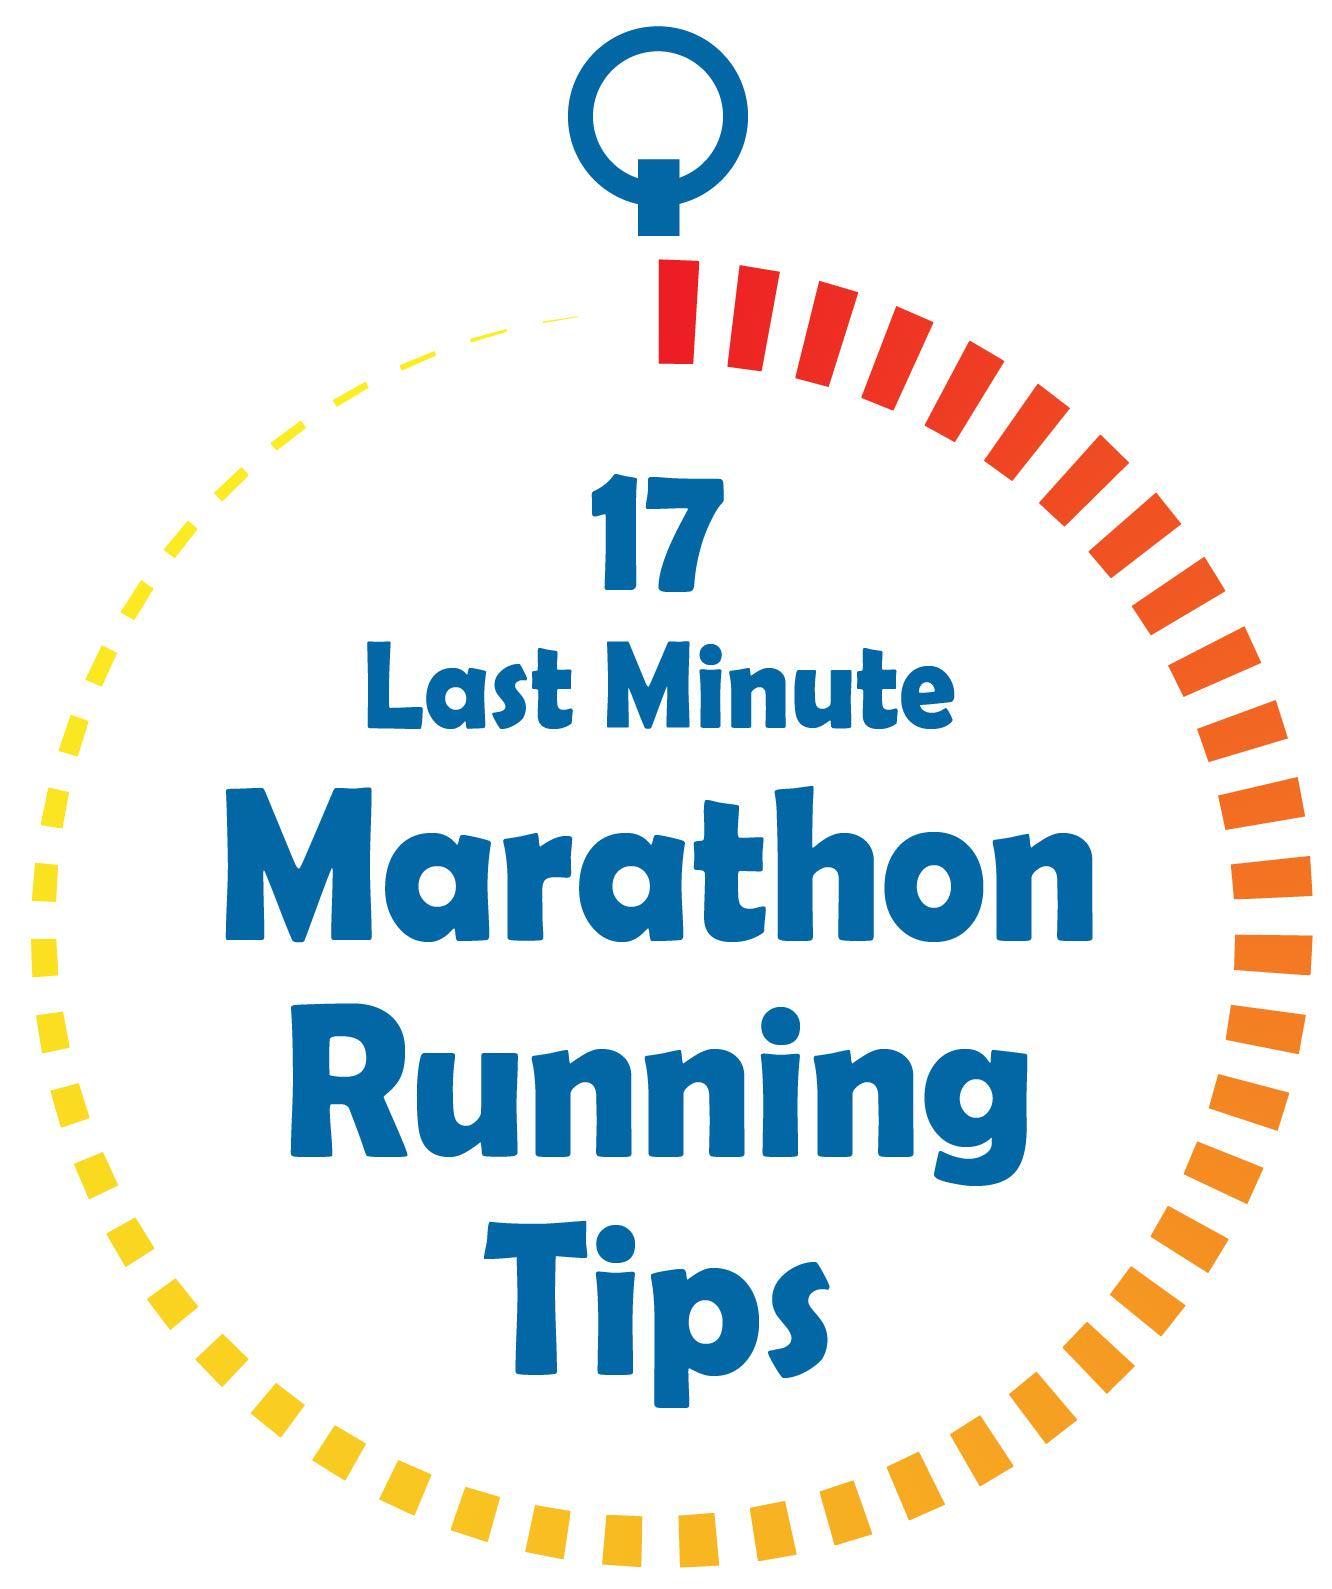 17 Last Minute Marathon Running Tips